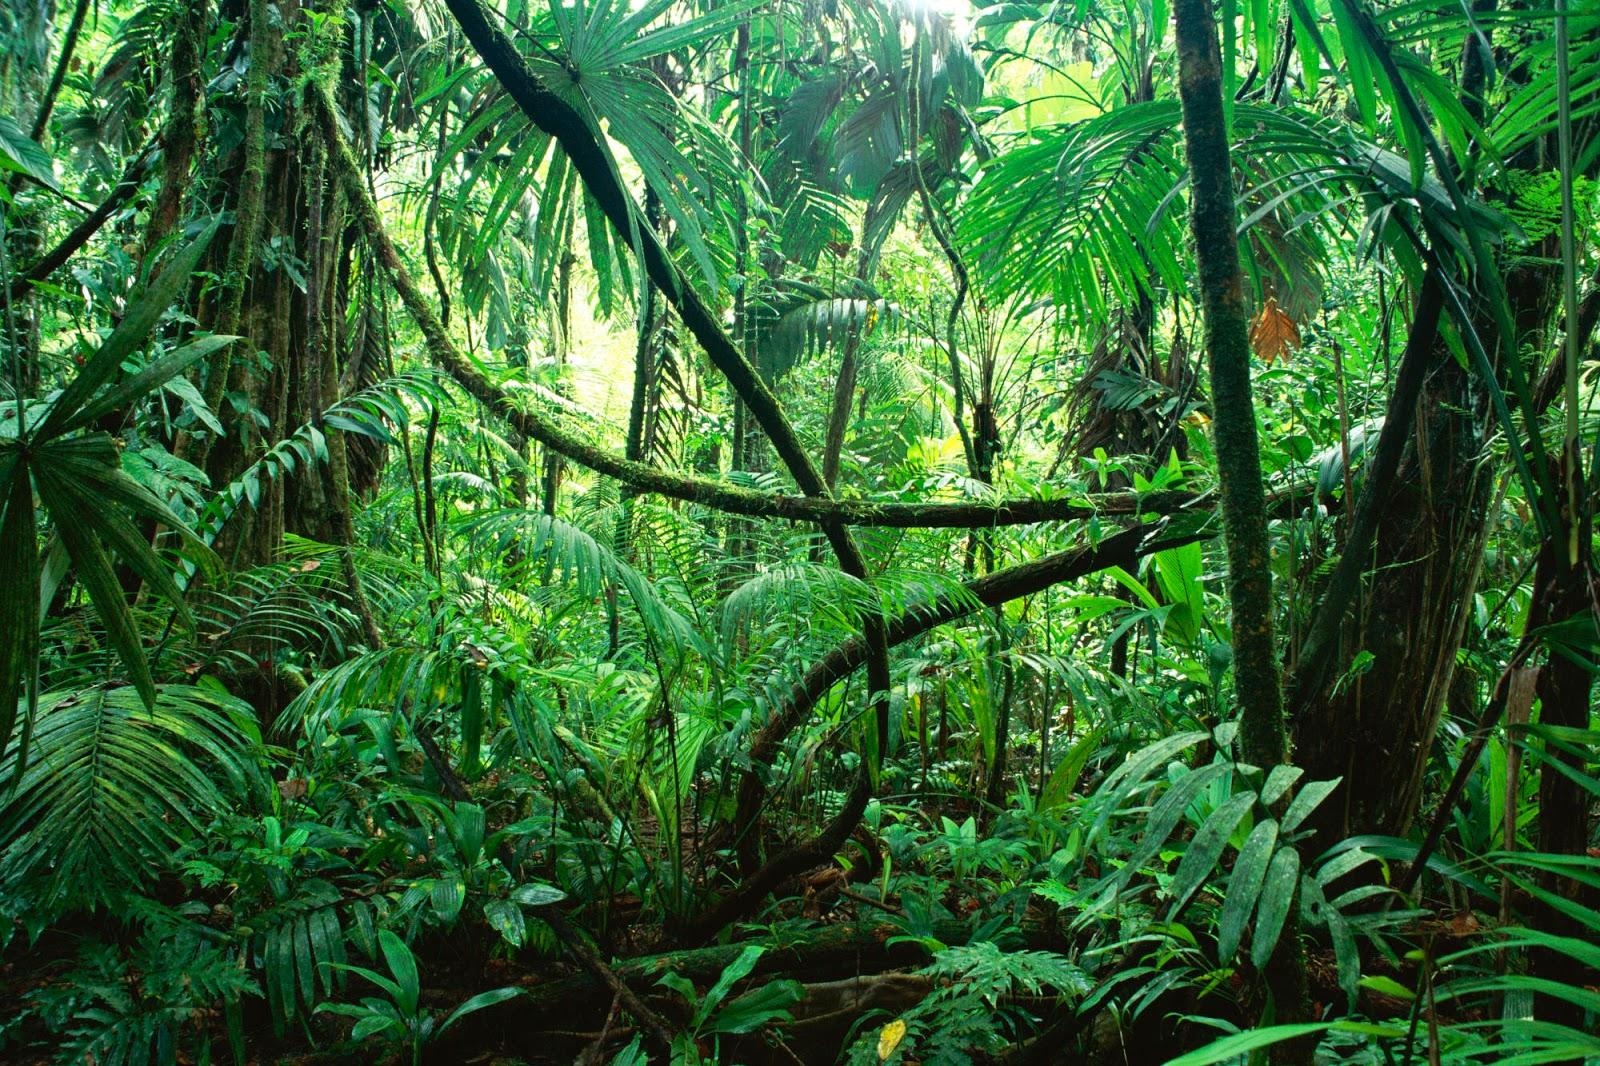 Geografi Lingkungan Rotan Tanaman Merambat Di Hutan Tropis